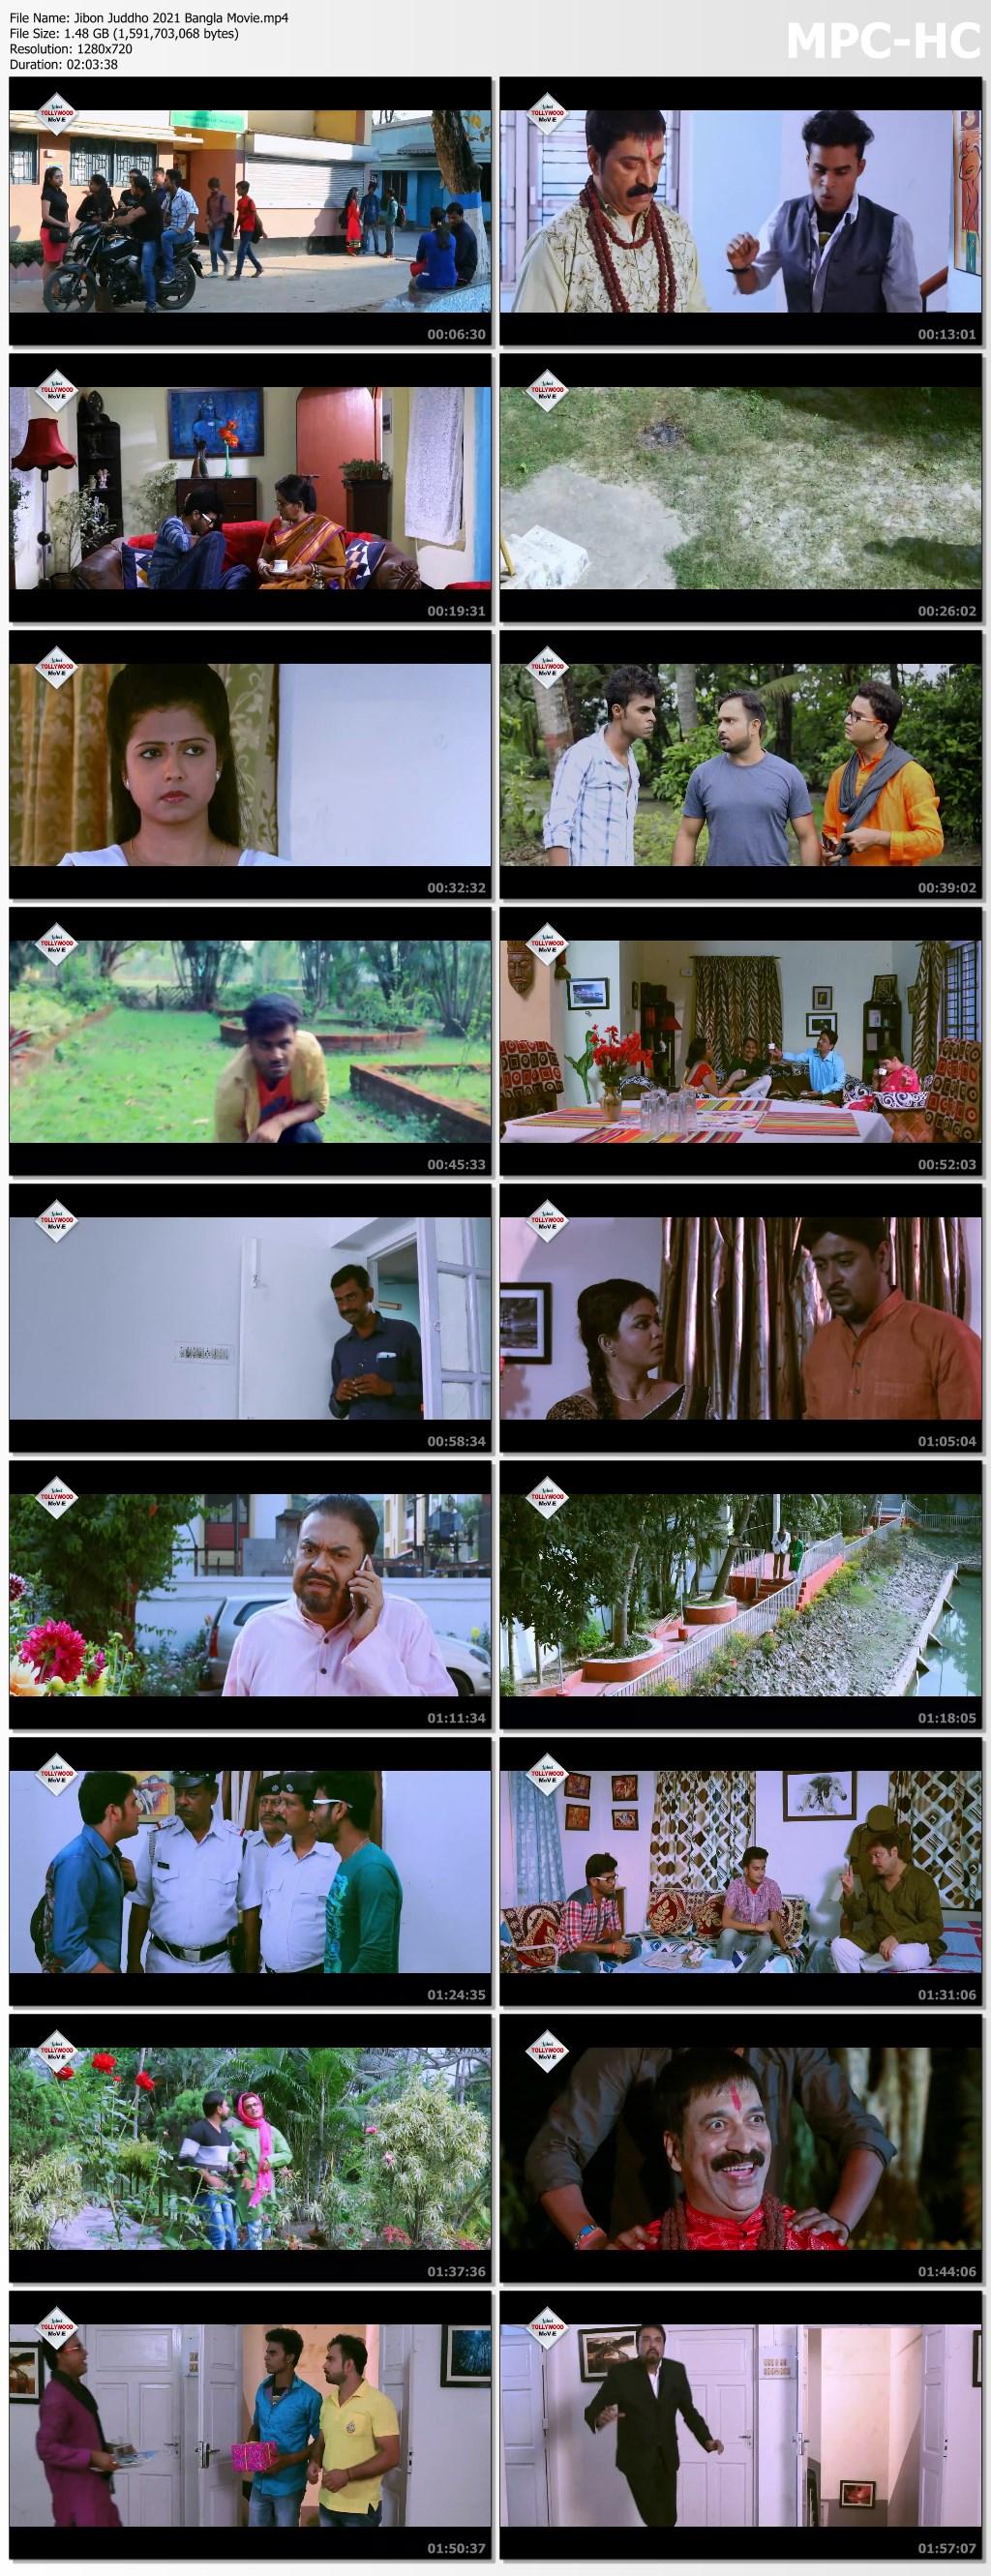 Jibon Juddho 2021 Bangla Movie.mp4 thumbs